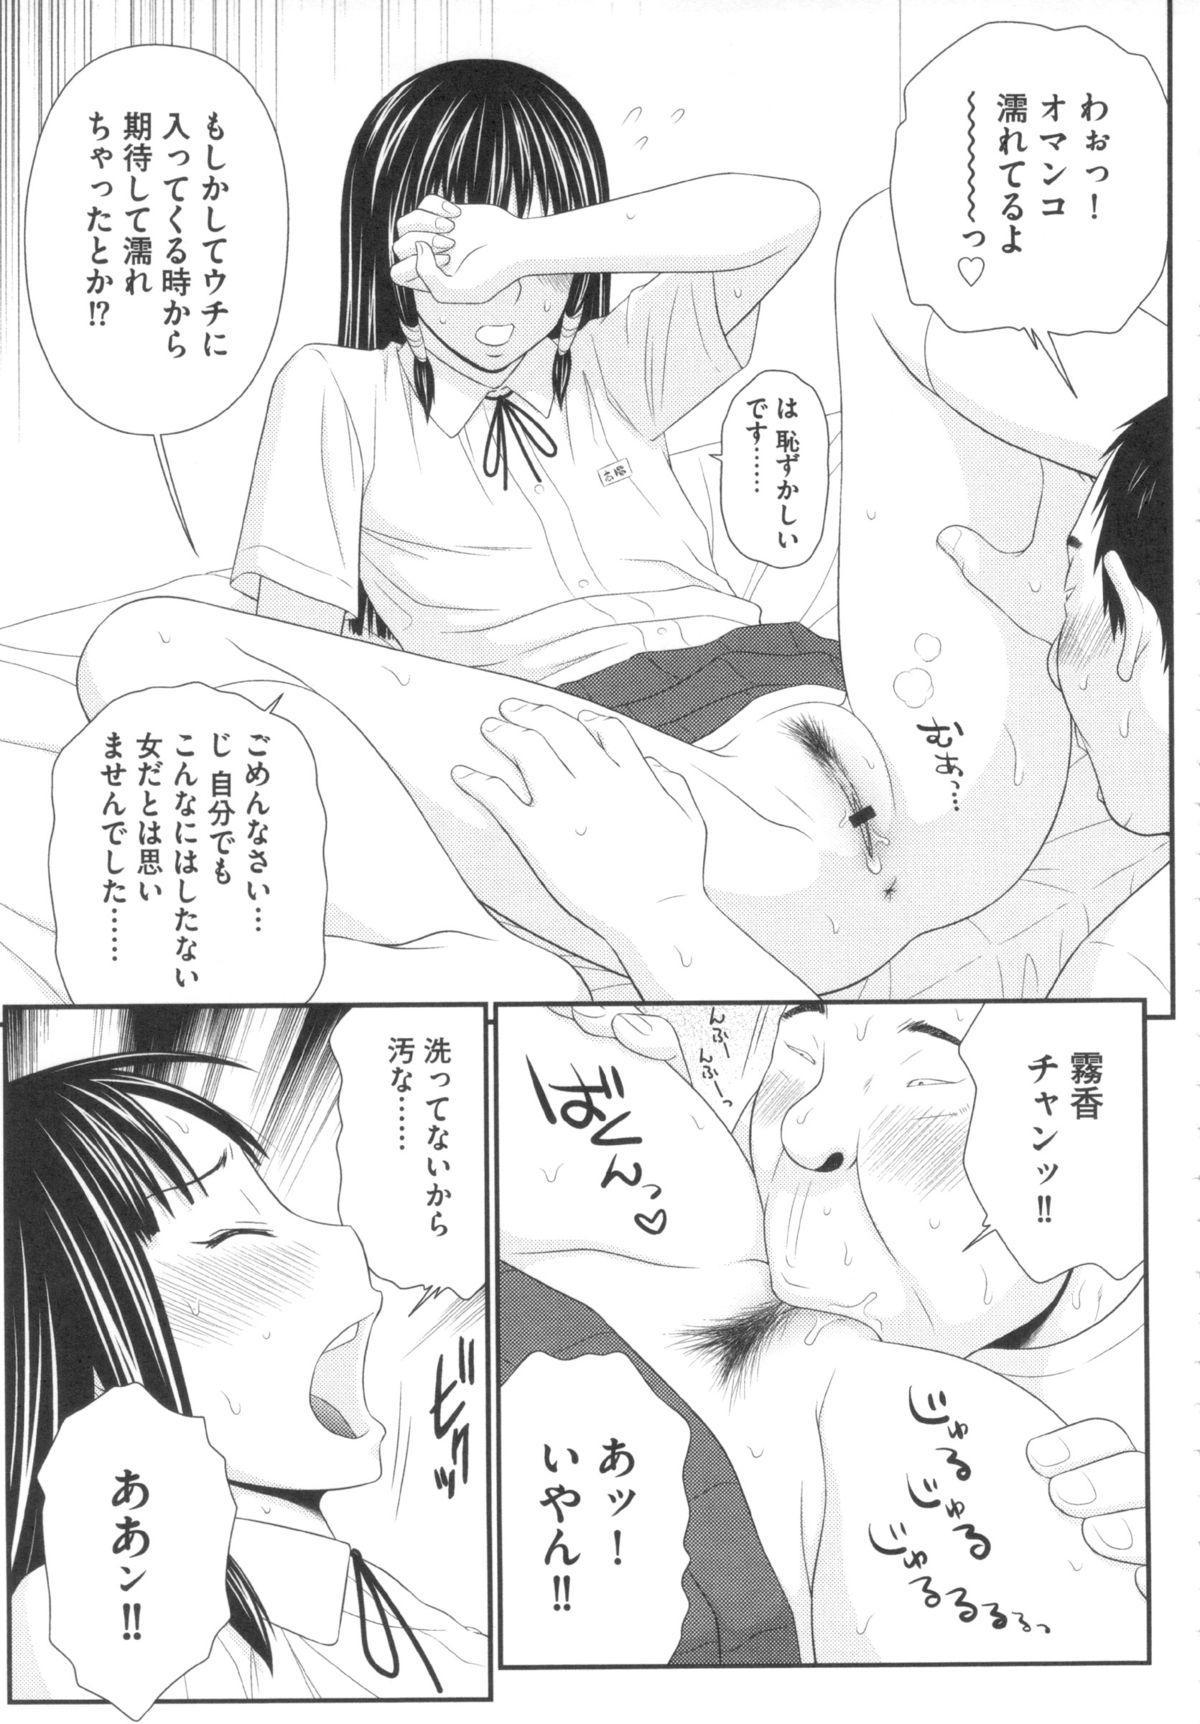 Kiseki No Zaajiru - Sperm of Miracle 91